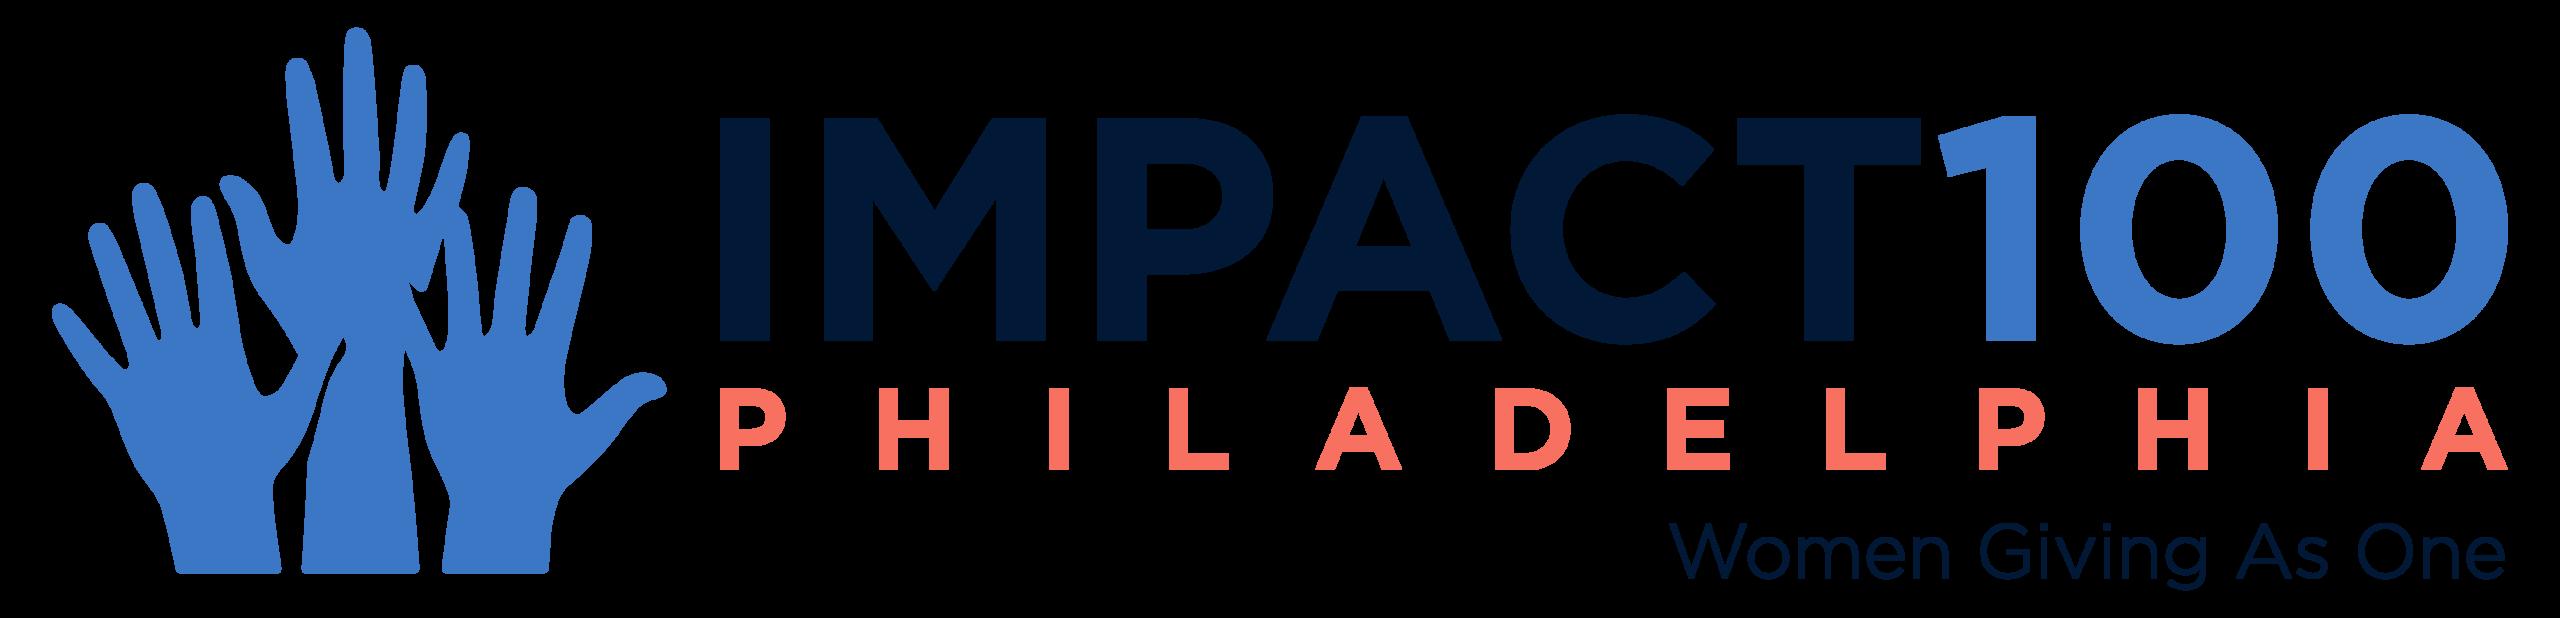 Impact100: Women Giving as One